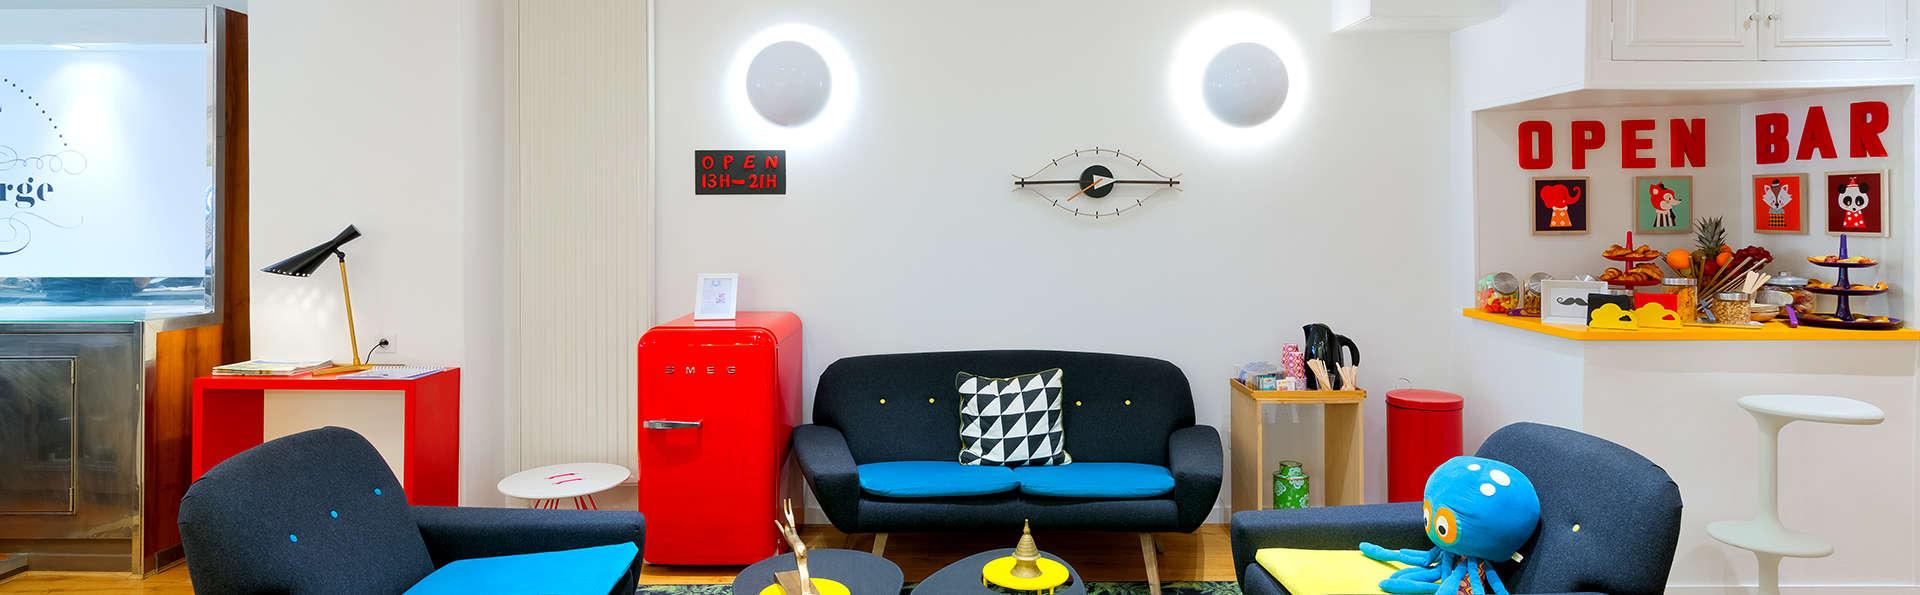 Hotel George - Astotel - Edit_Lounge4.jpg